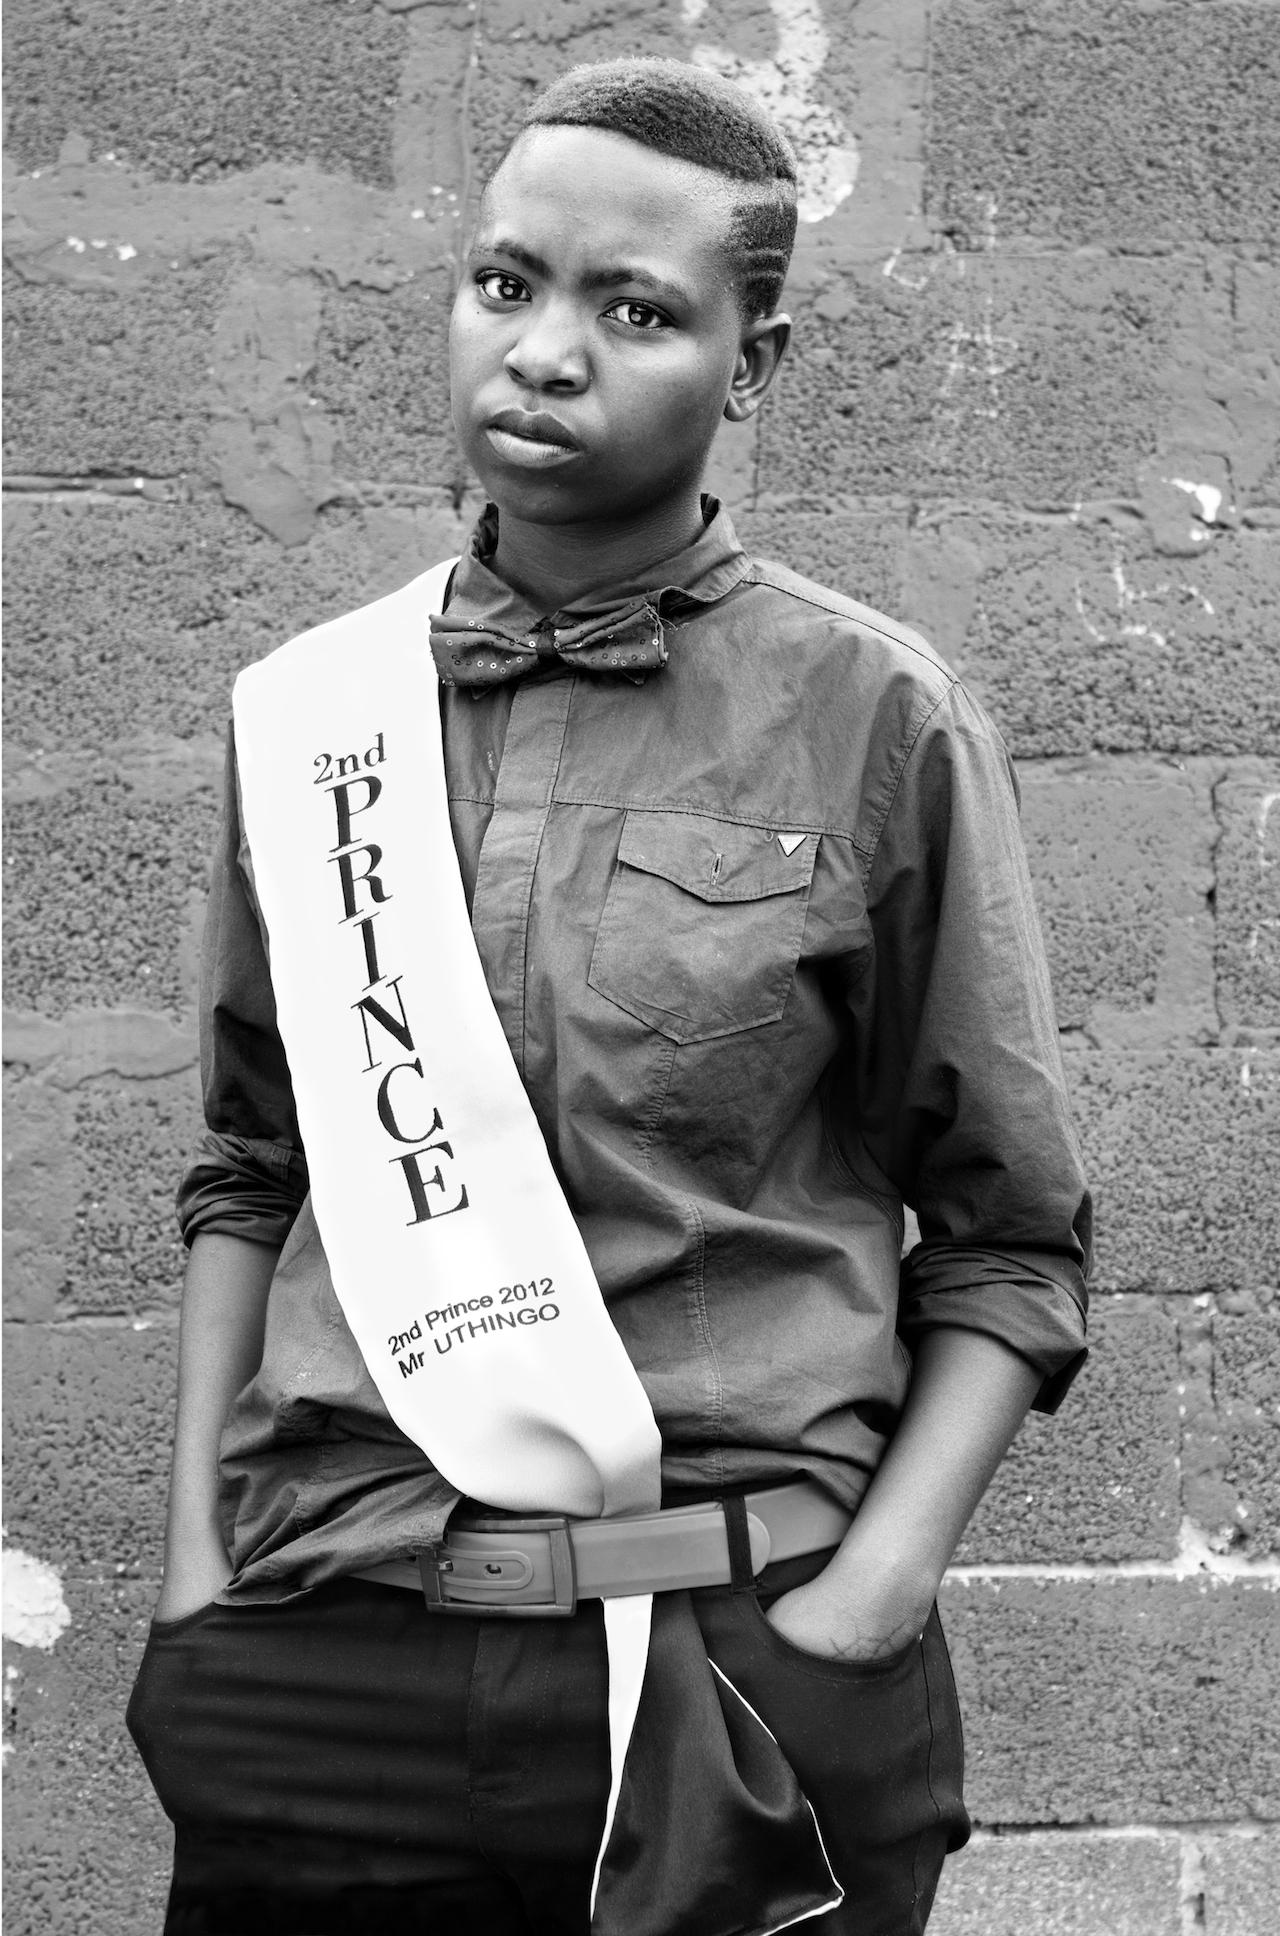 Zanele Muholi (South African, born 1972). Collen Mfazwe, August House, Johannesburg, 2012, 2012. Gelatin silver photograph, 34 x 24 in. (86.5 x 60.5 cm). © Zanele Muholi. Courtesy of Stevenson Cape Town/Johannesburg and Yancey Richardson, New York